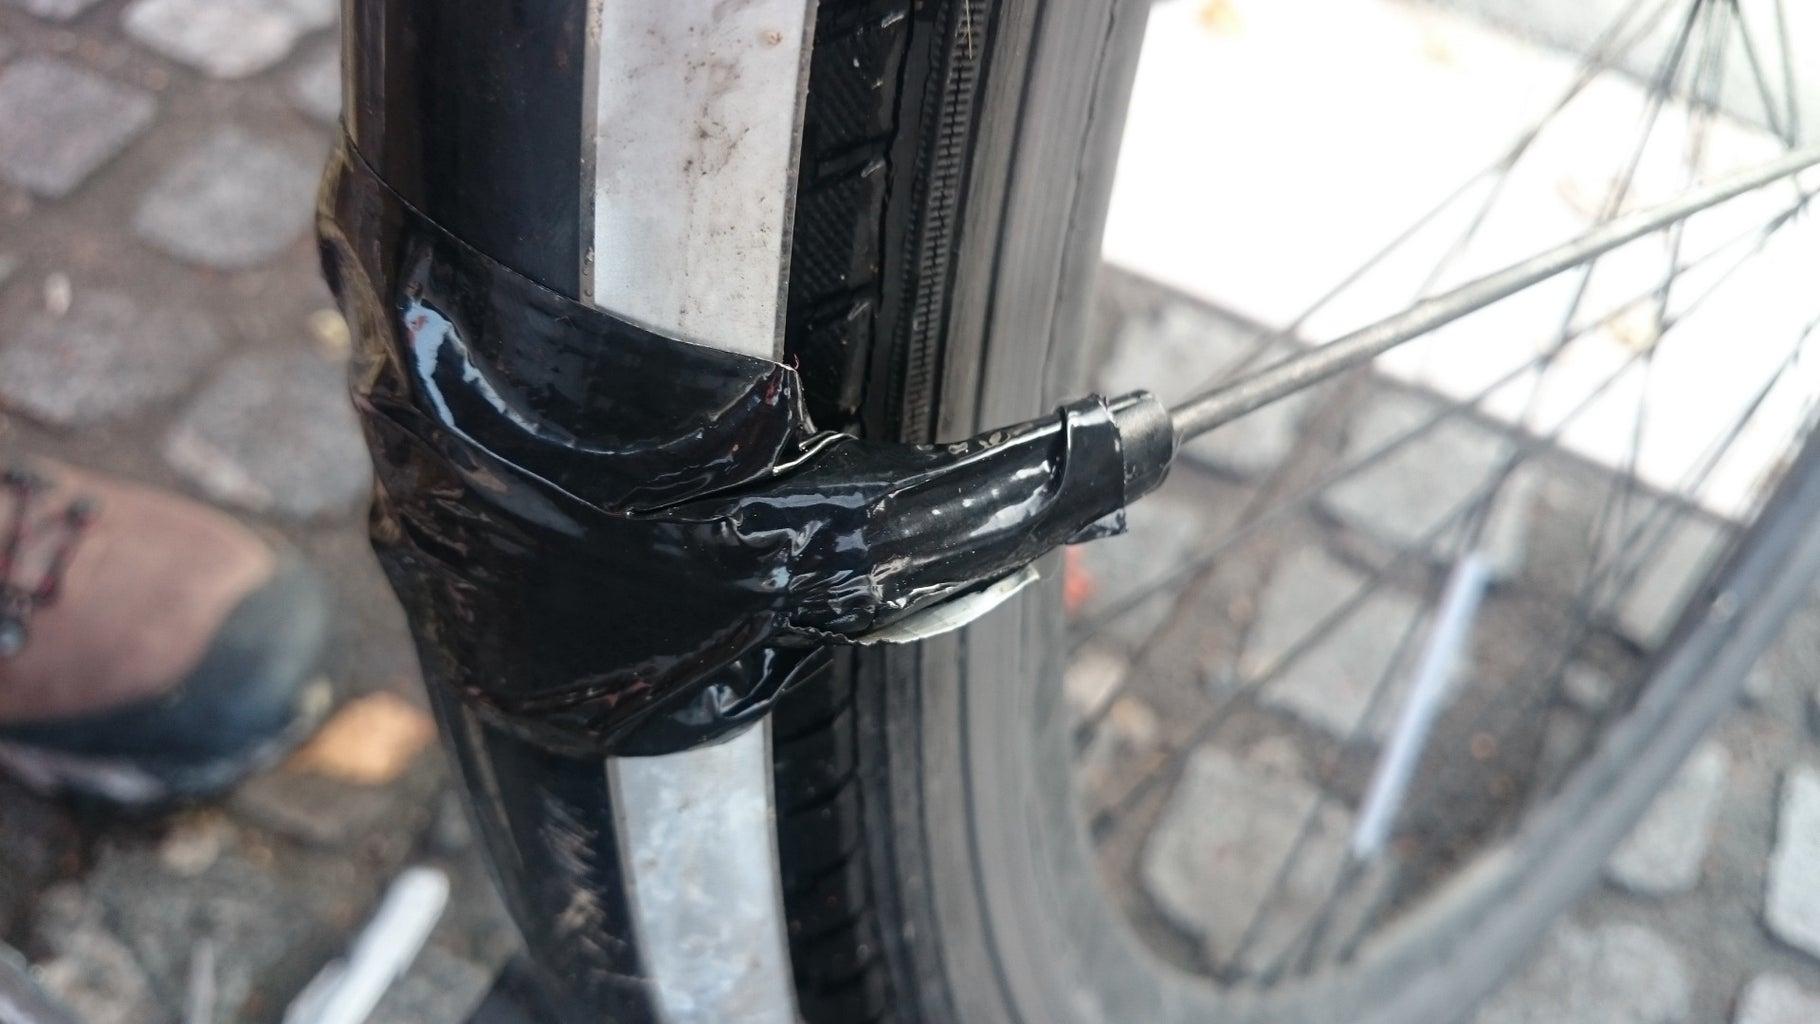 Repair Your Bike's Mudguard Holder With Duckttape